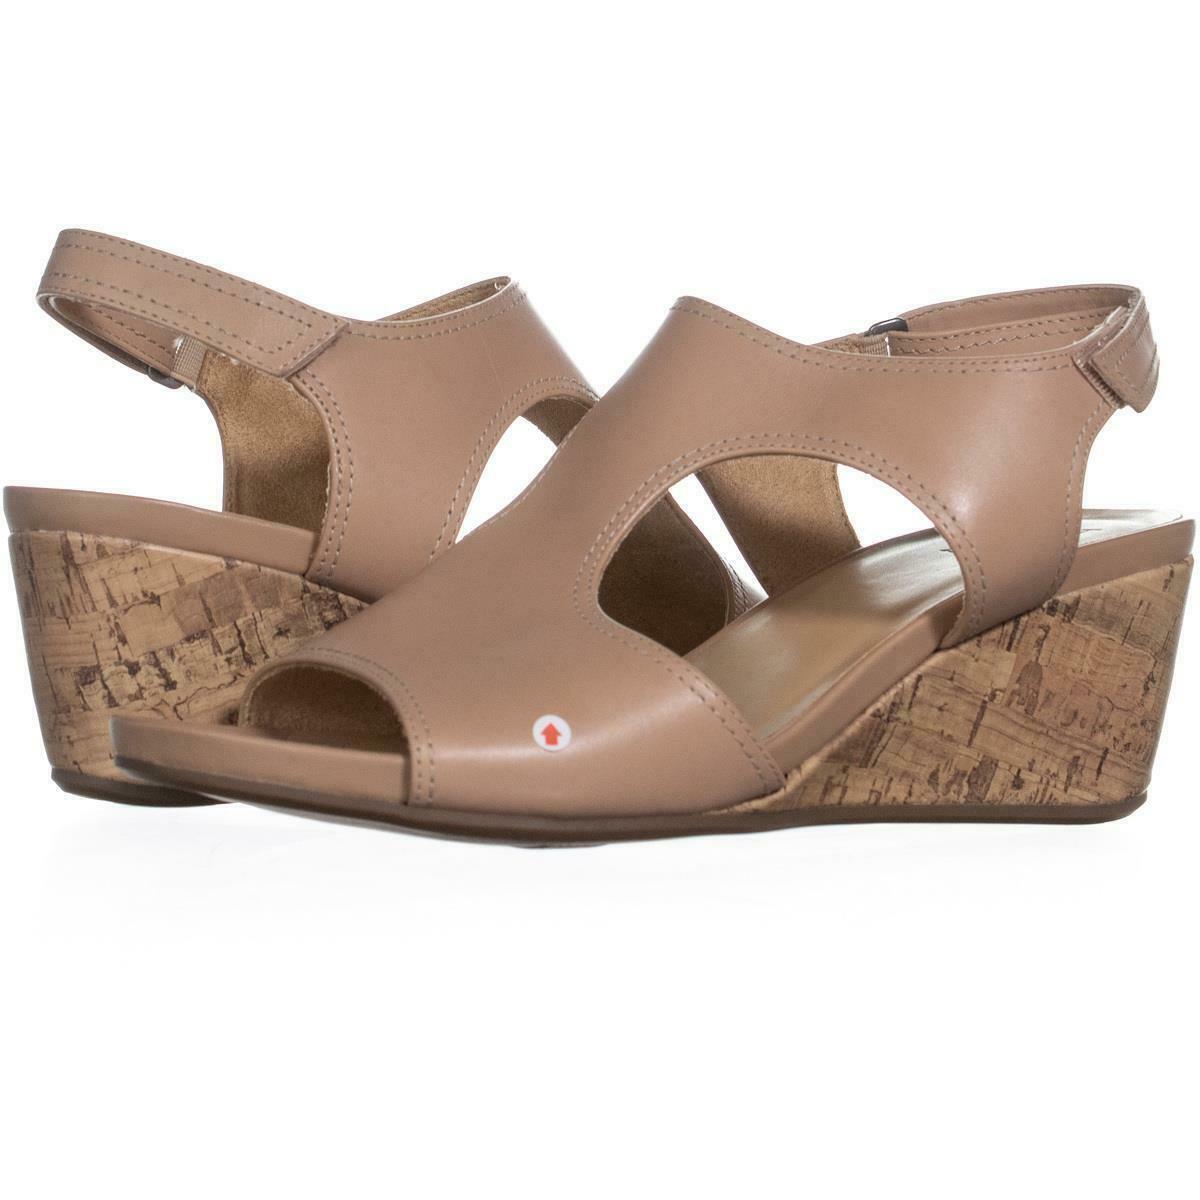 f7f0439dca naturalizer Cinda Wedge Sandals 390, Ginger, 11 W US - $27.83